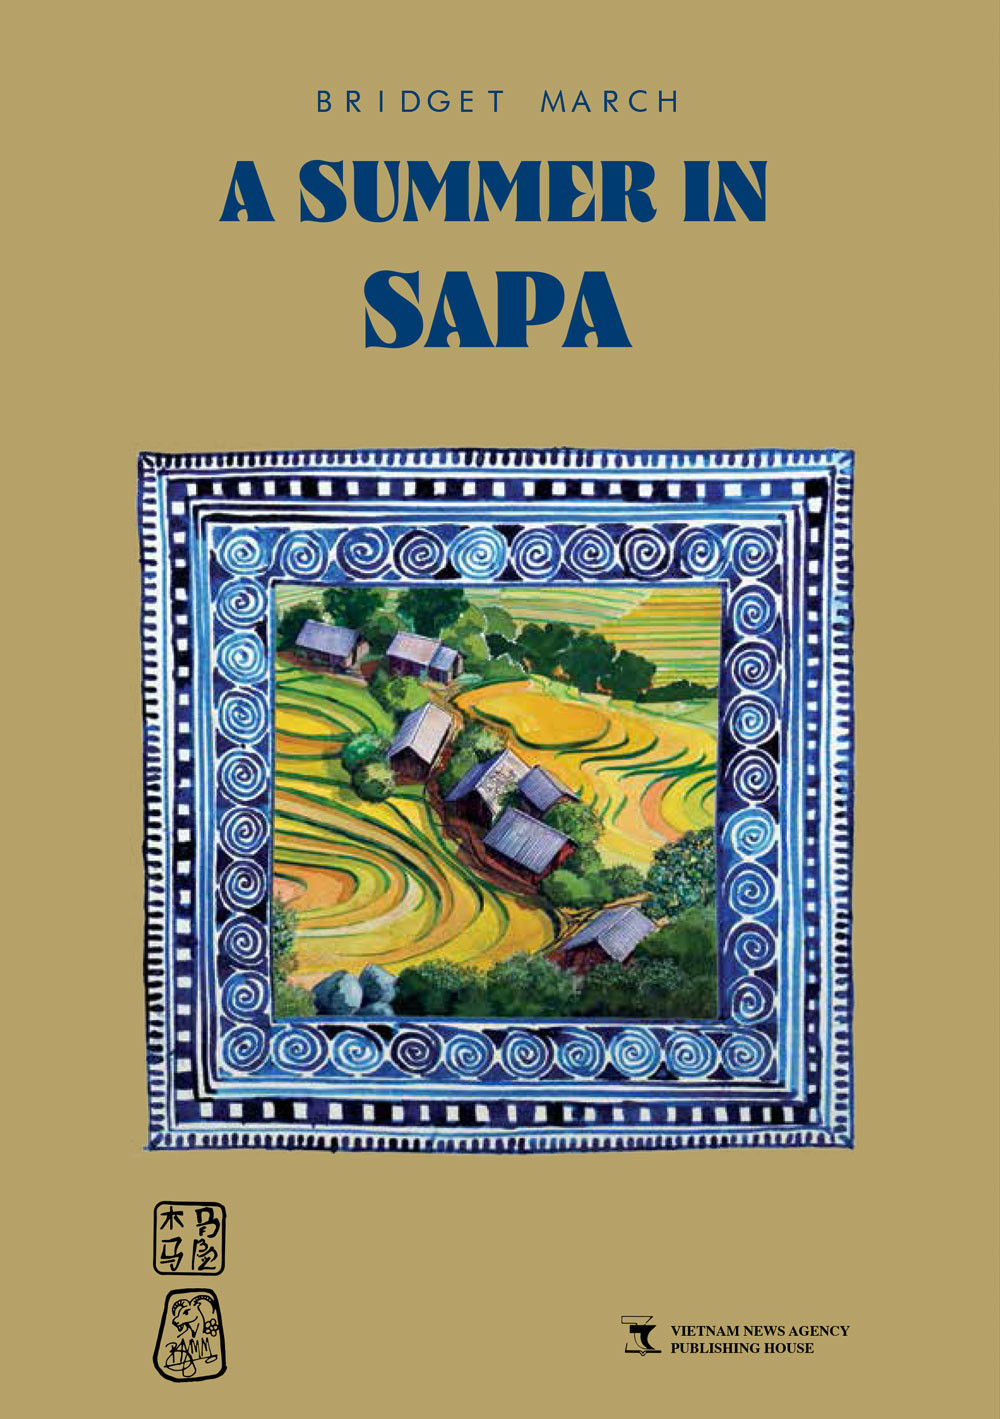 Sapa-book-promoting-1.jpg